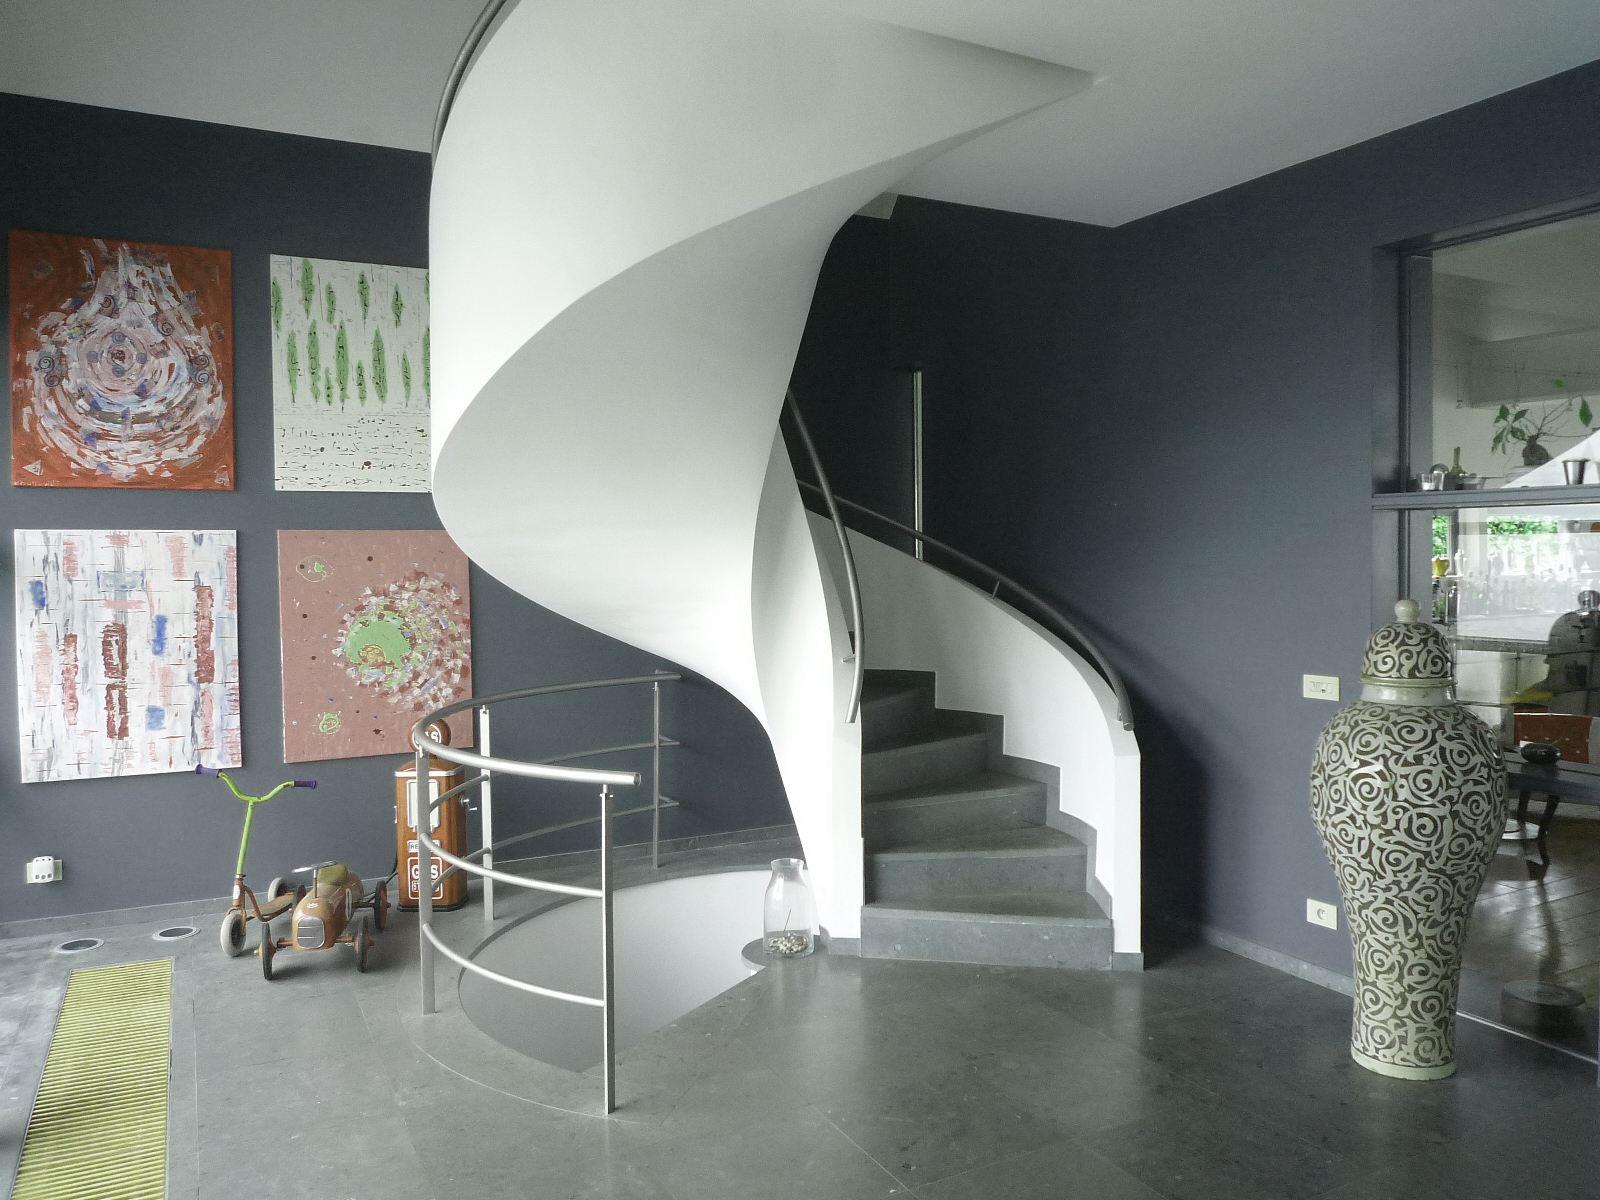 sales property at Kortrijk residential cubic Villa 400m2 habitable.